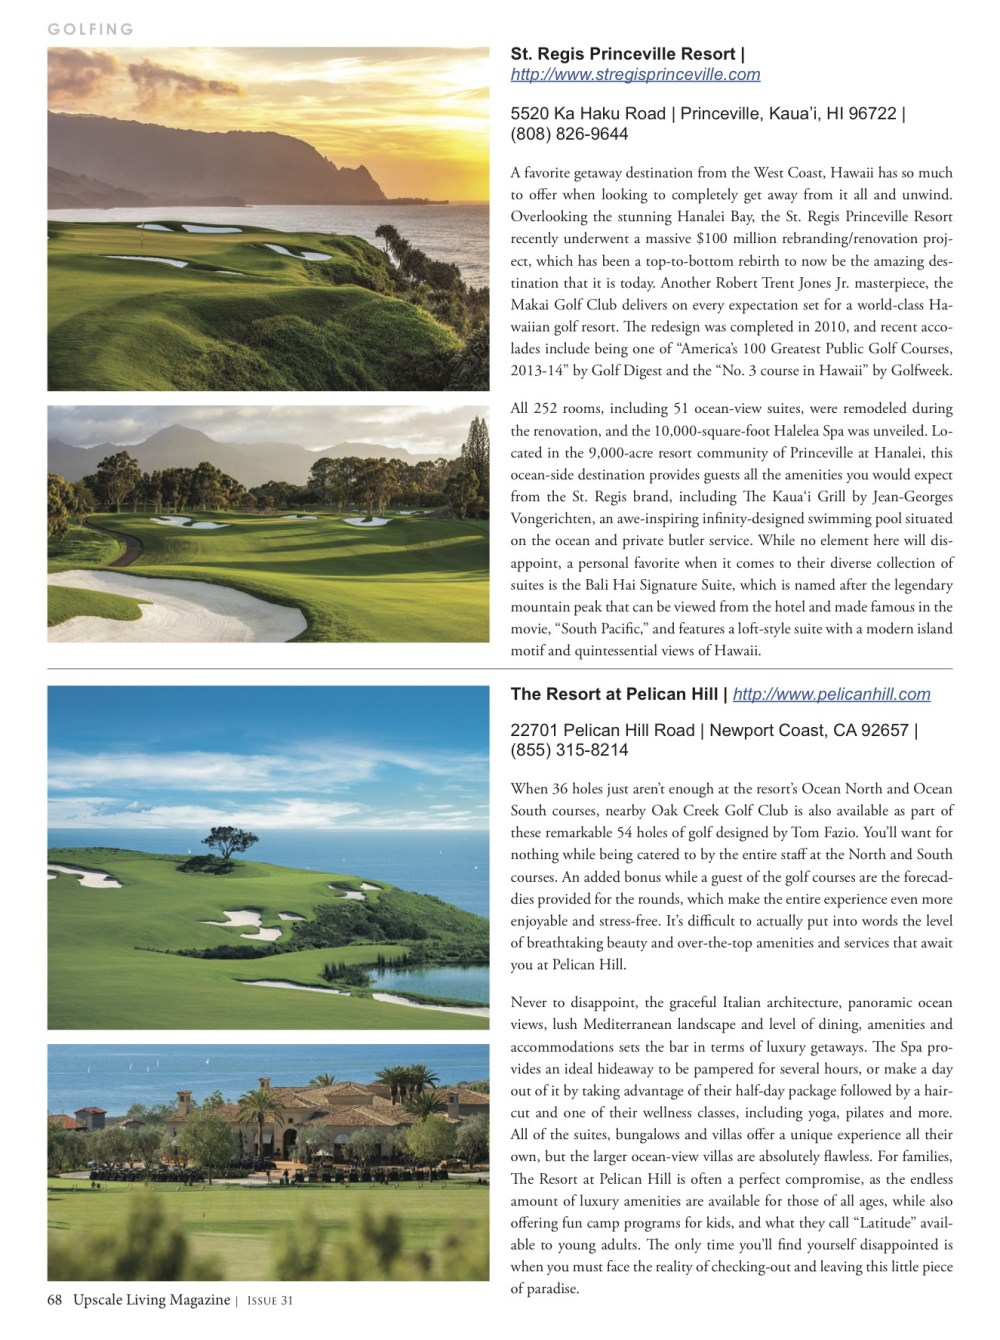 ULM_DamonMBanks_Golf_4